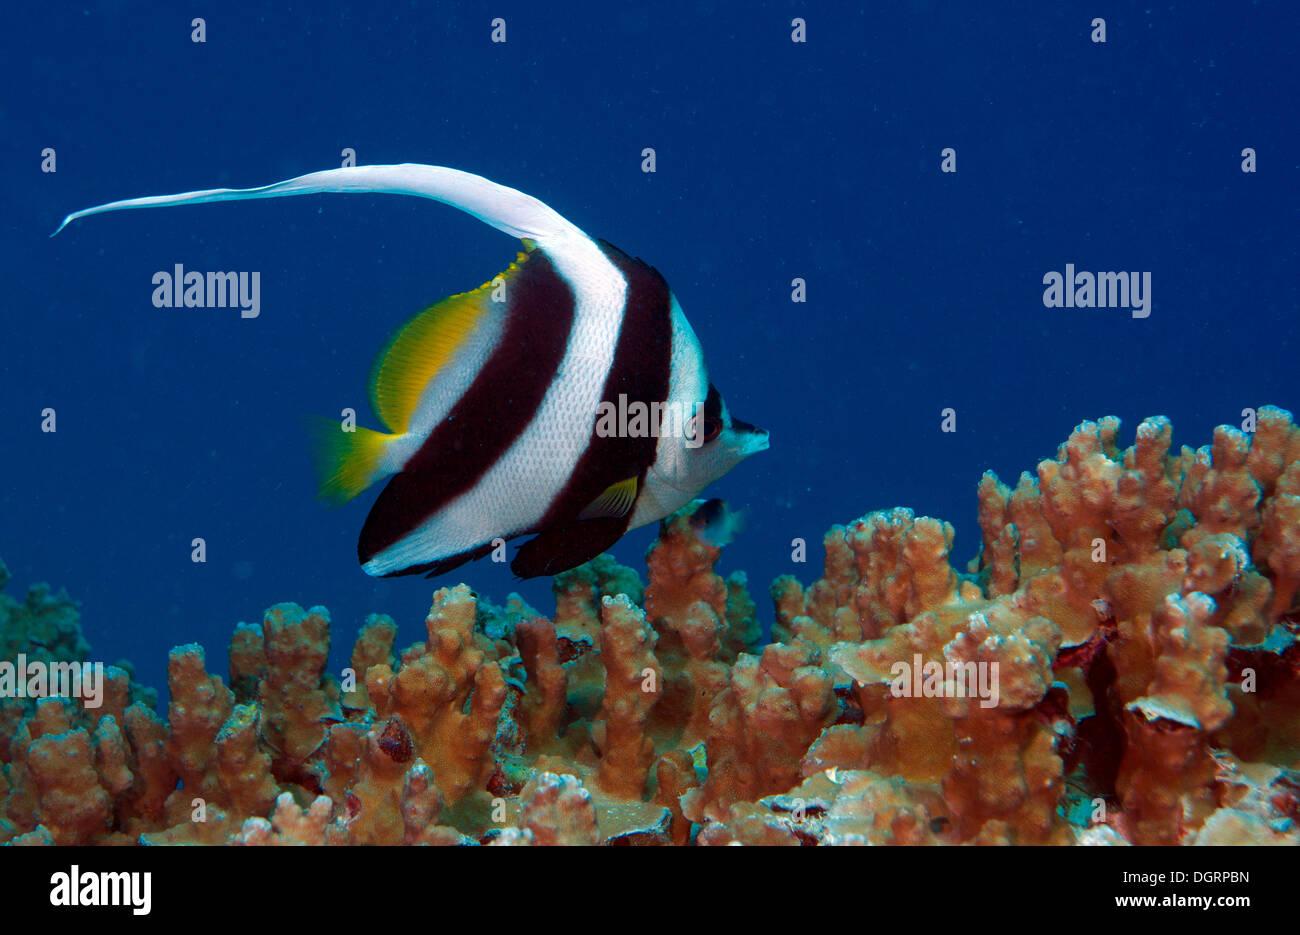 Pennant coralfish also longfin bannerfish (Heniochus acuminatus), Great Barrier Reef, Queensland, Australia - Stock Image